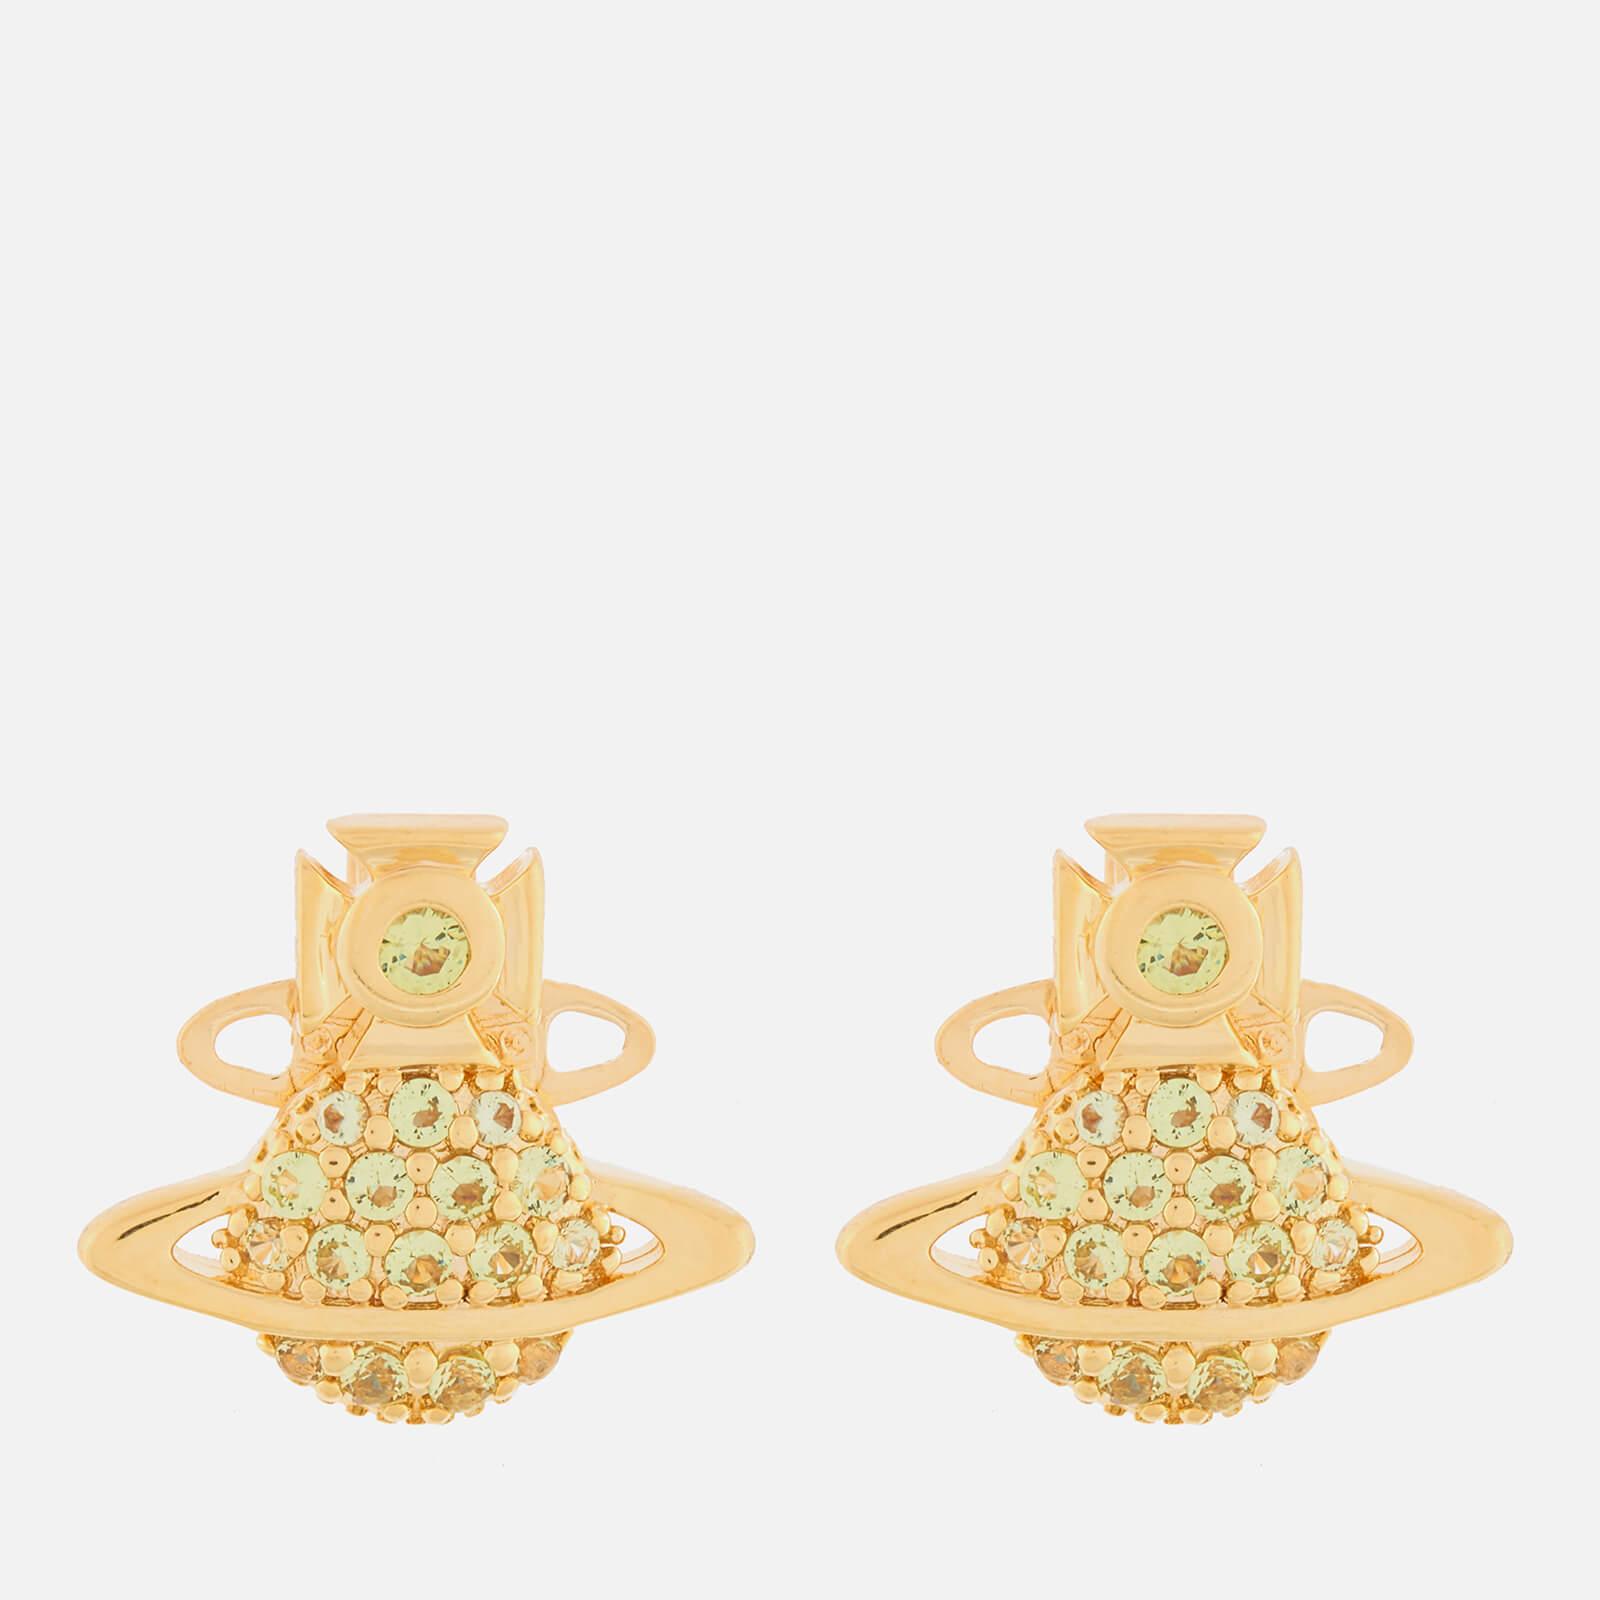 Vivienne Westwood Women's Tamia Earrings - Gold Peridot